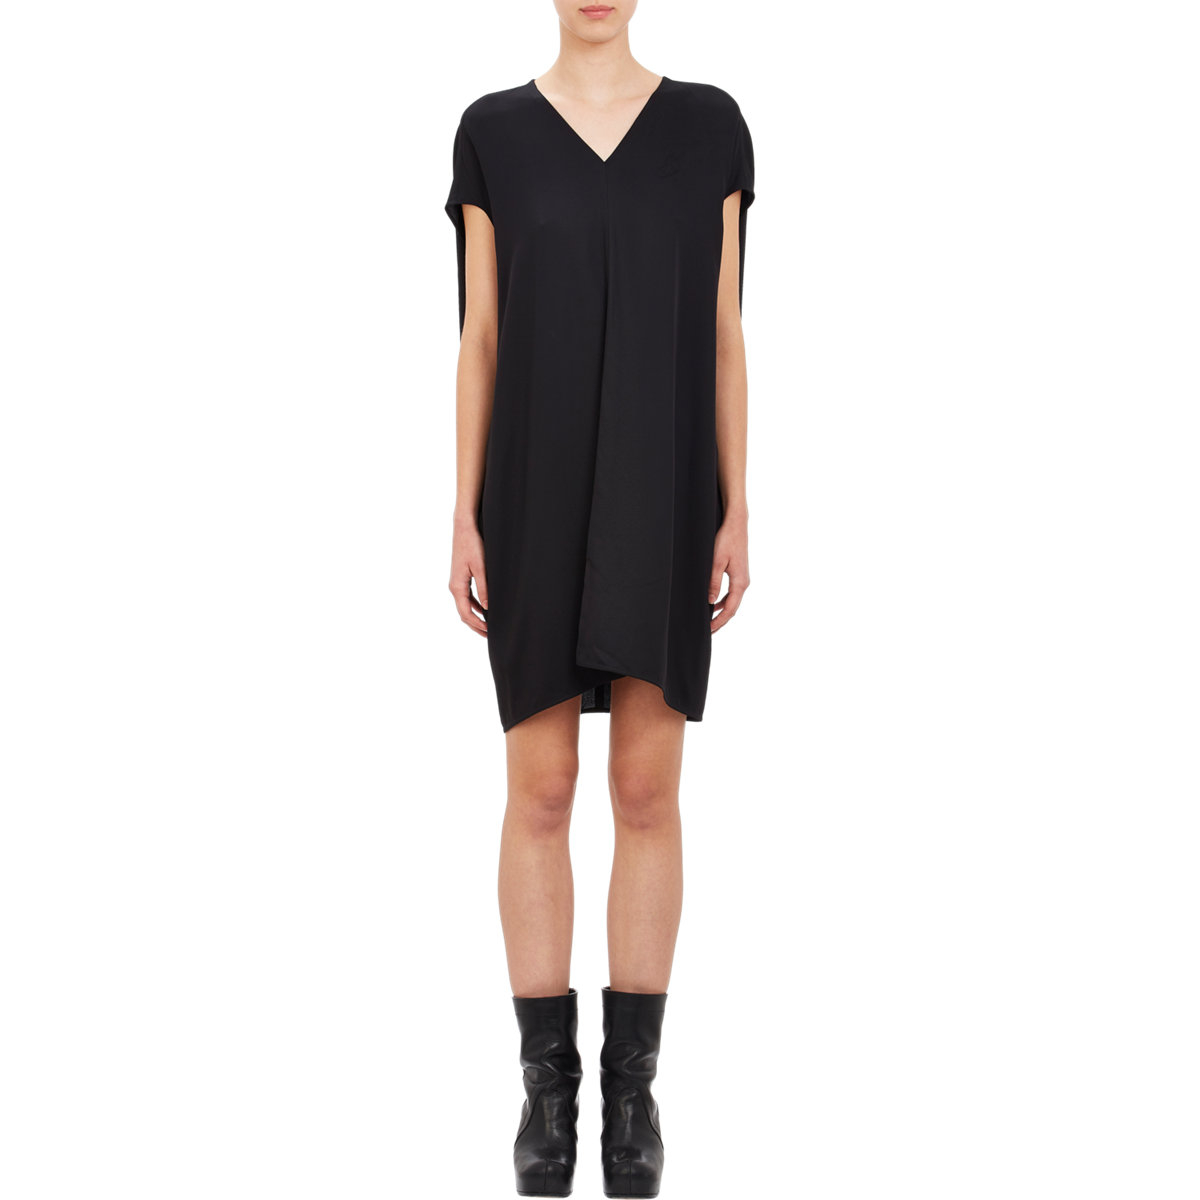 Rick Owens slash neck dress Geniue Stockist New Arrival Fashionable Sale Online hmbeTK